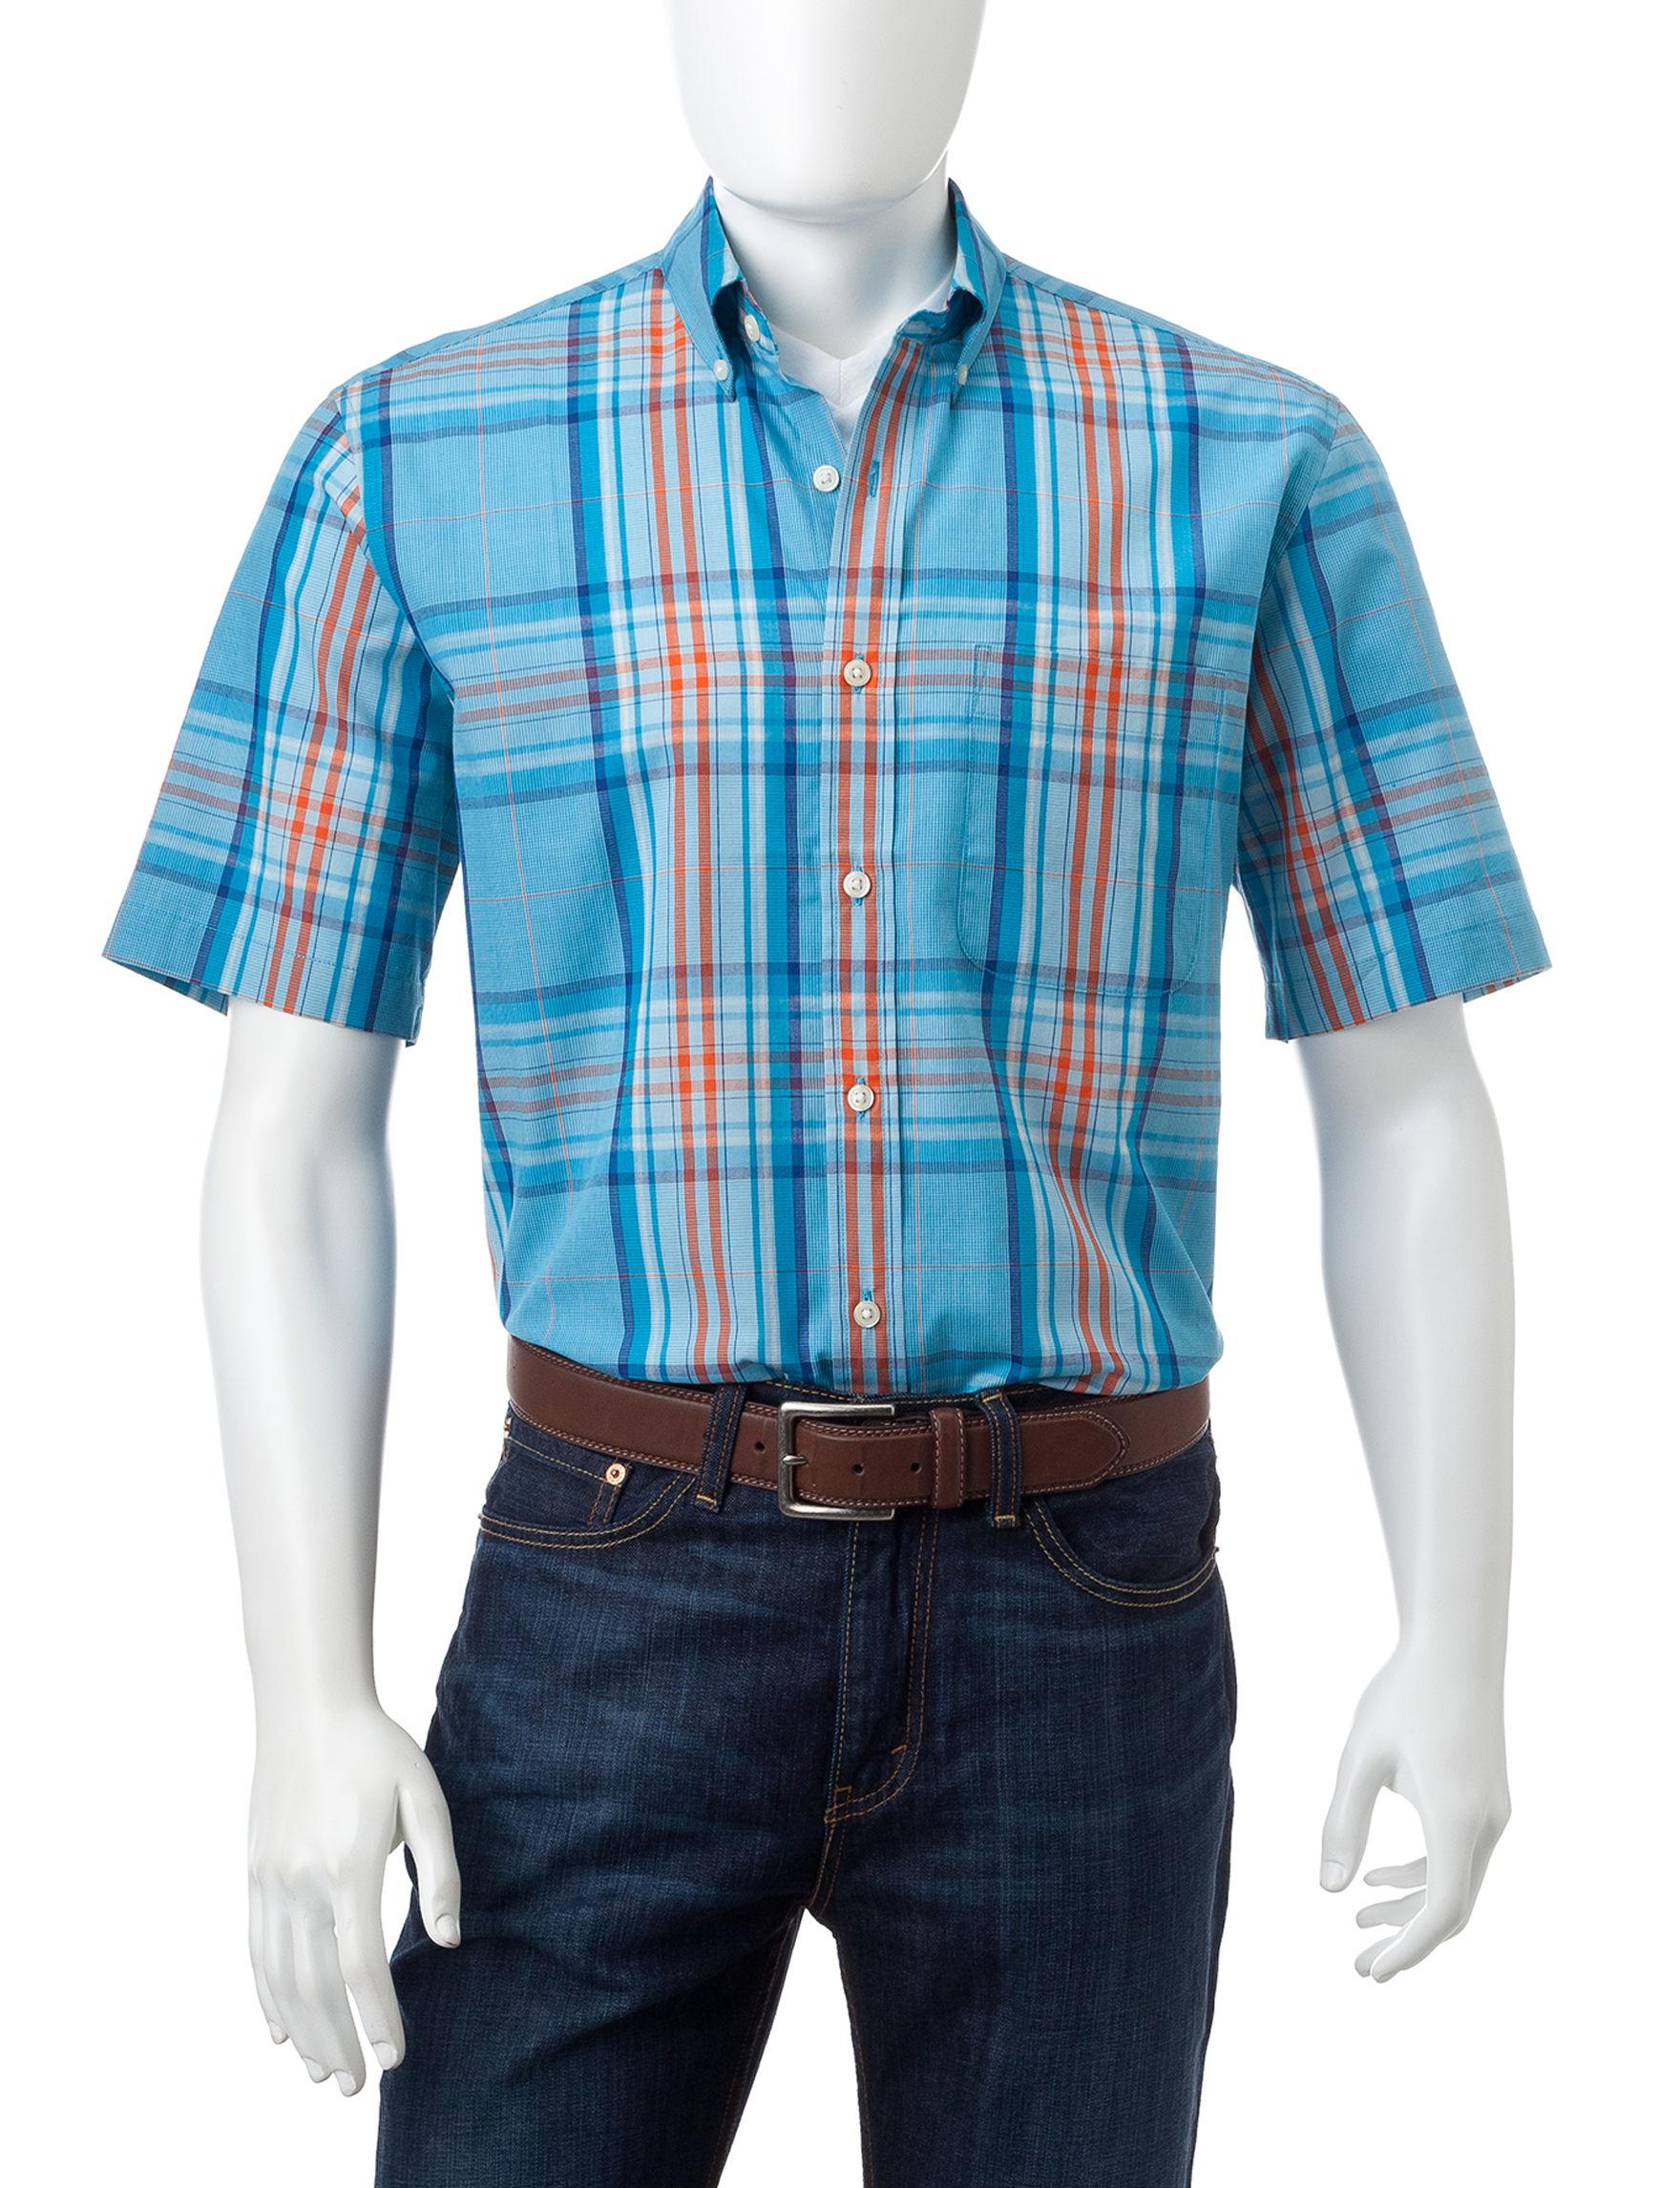 Sun River Bright Blue Casual Button Down Shirts